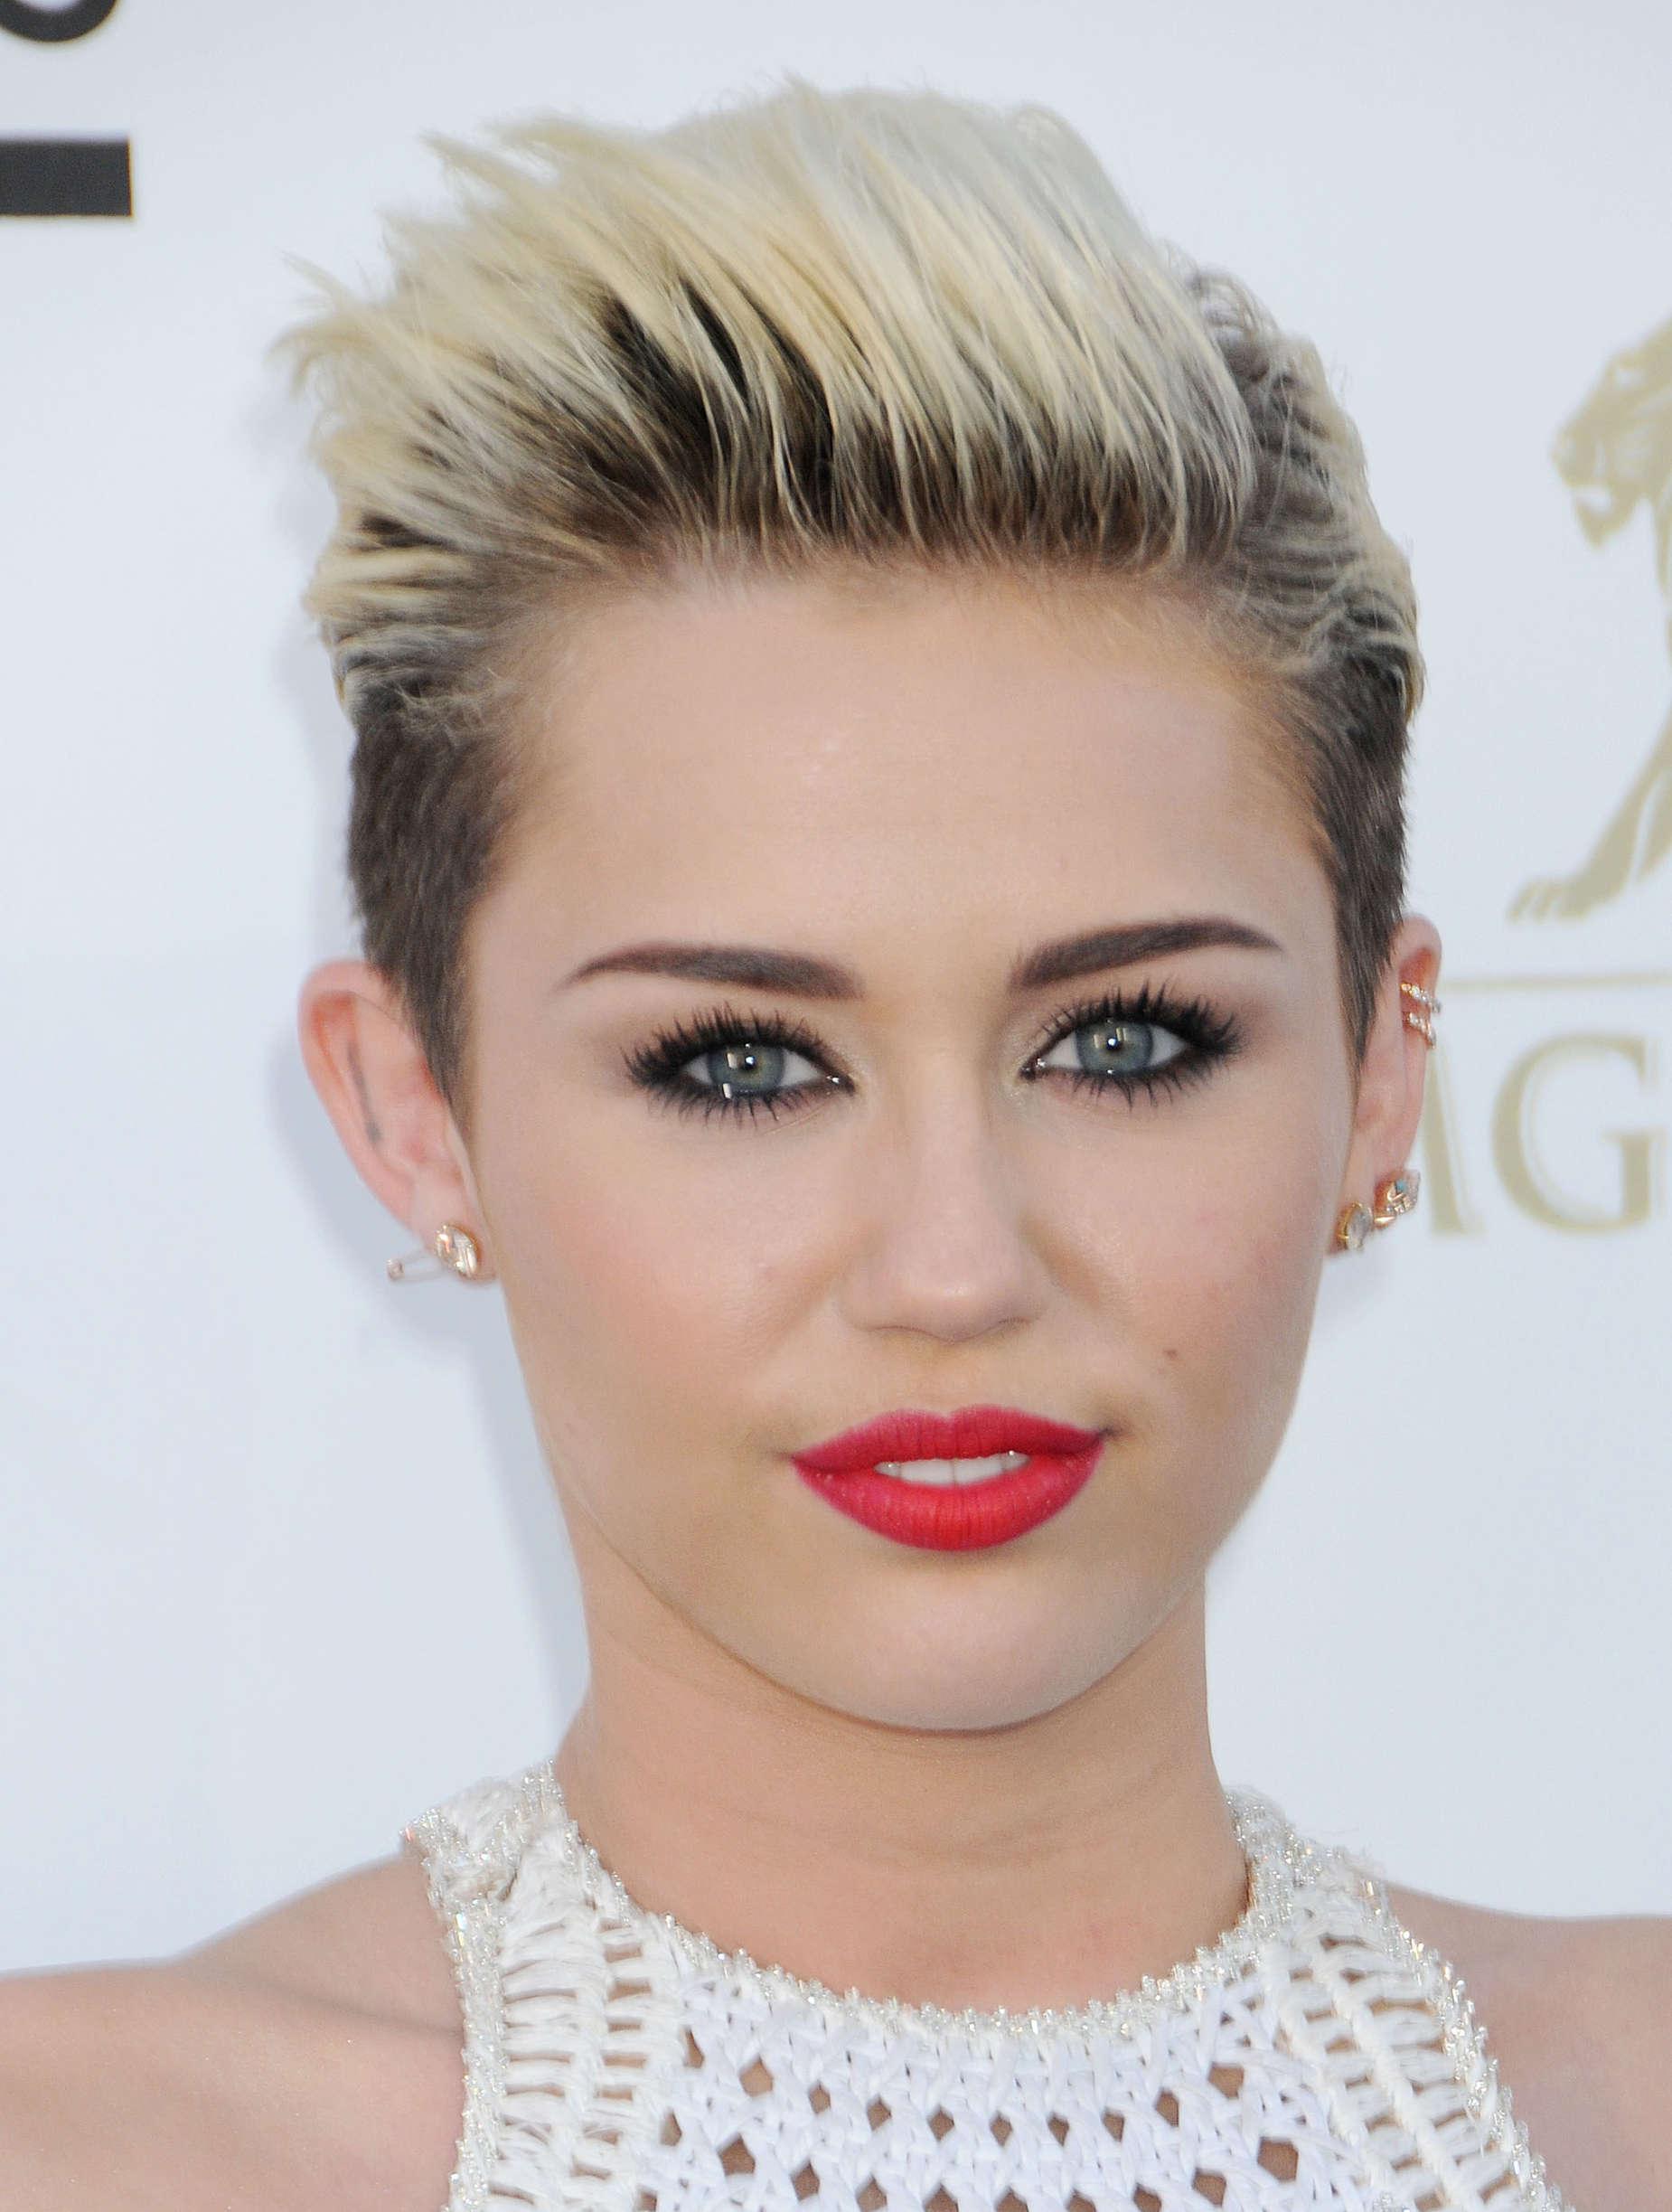 Miley Cyrus - 2013 Billboard Music Awards in Las Vegas -04 - GotCeleb Miley Cyrus